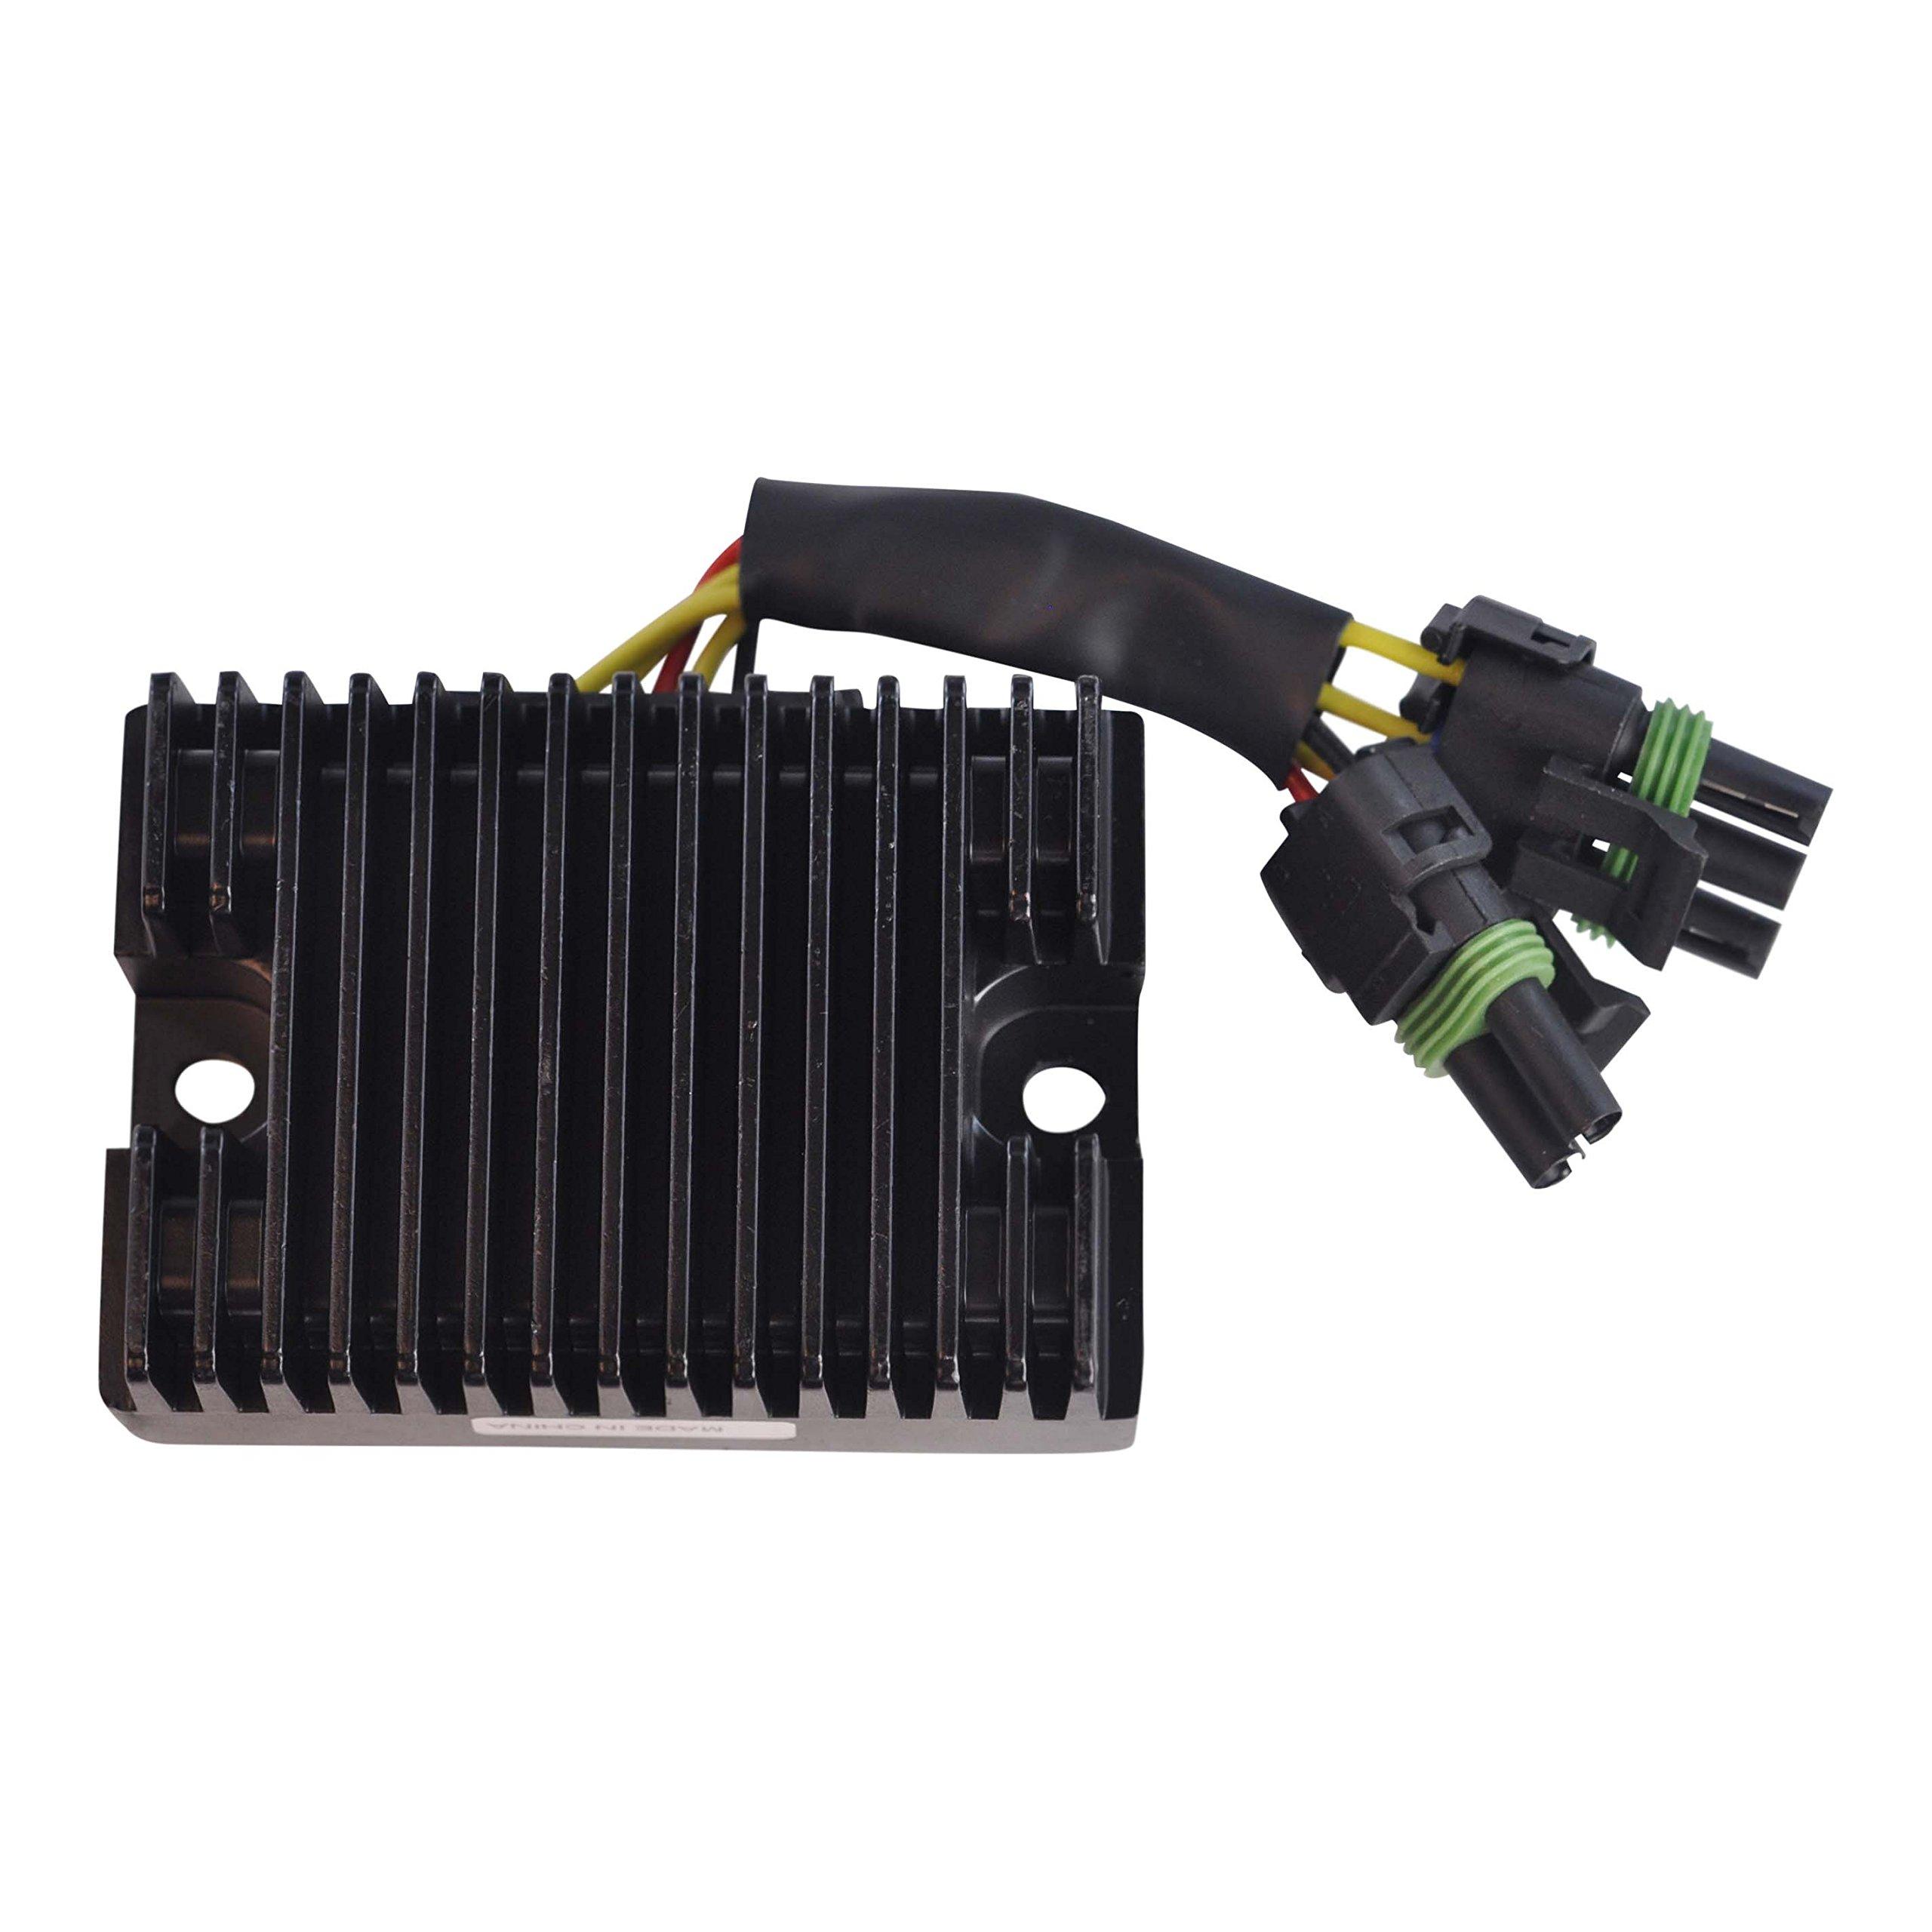 Seadoo RX DI Voltage Rectifier Regulator 1998-2006 GTX DI RFI XP DI GTI